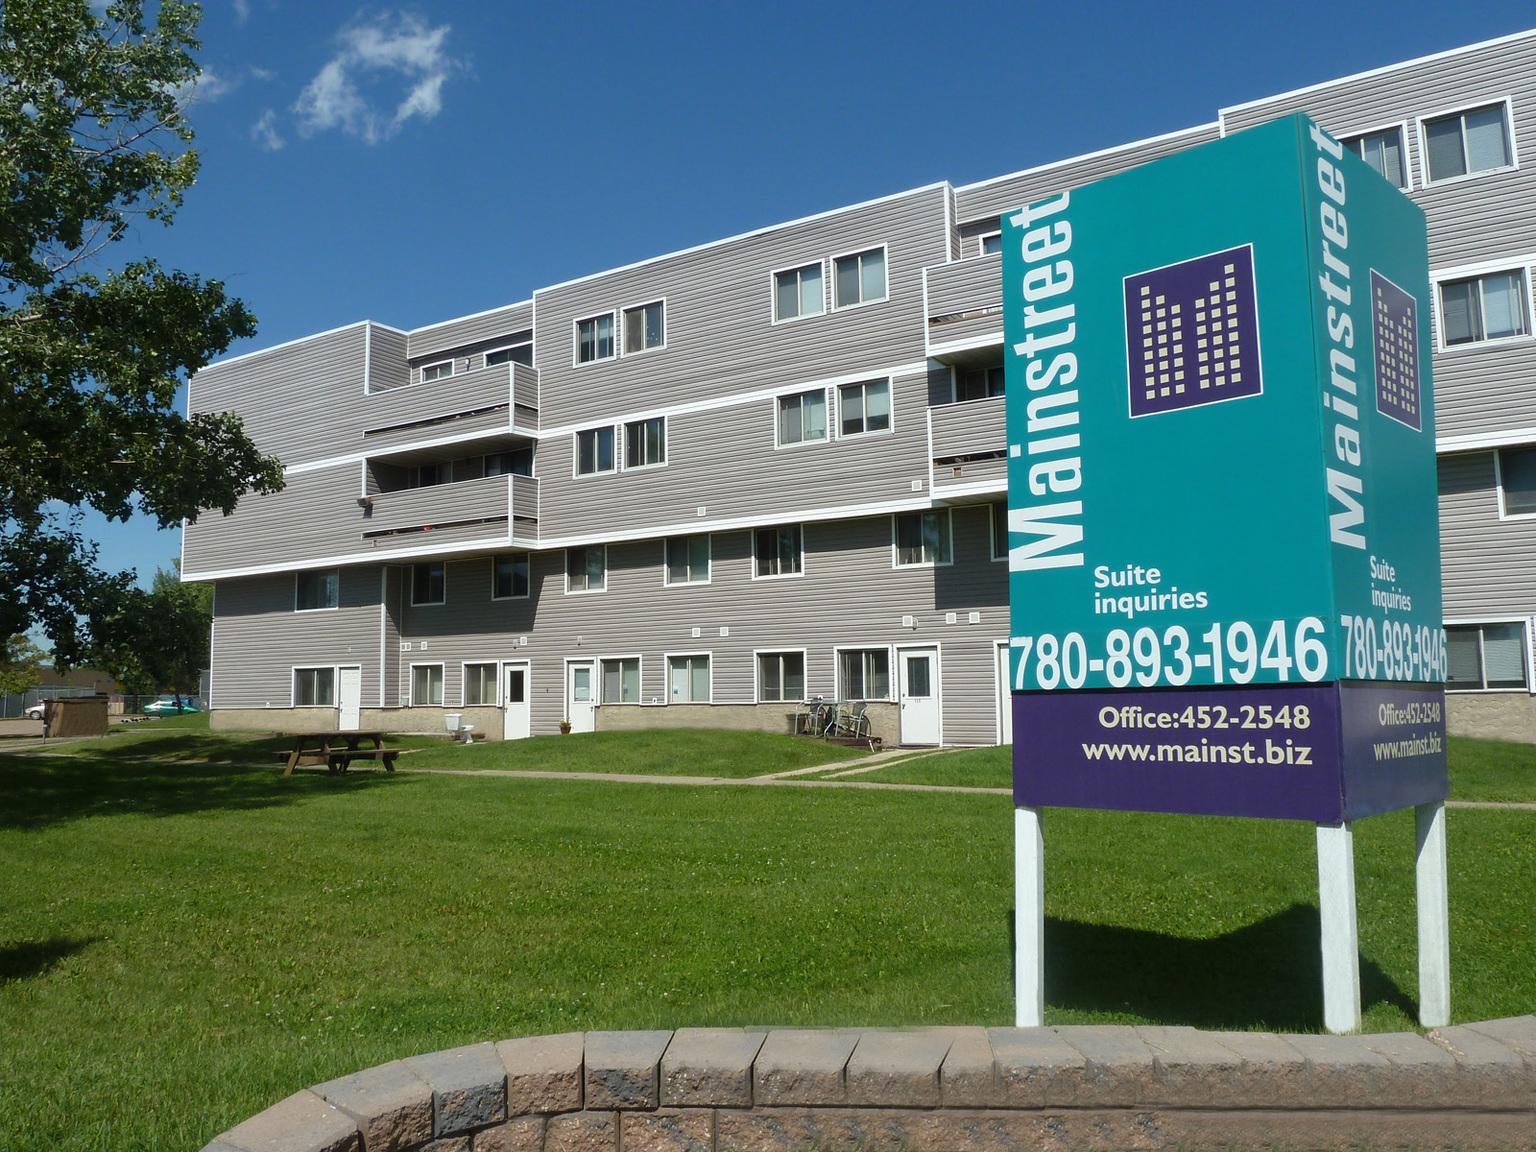 2606 139 Avenue NW, Edmonton, AB - $1,120